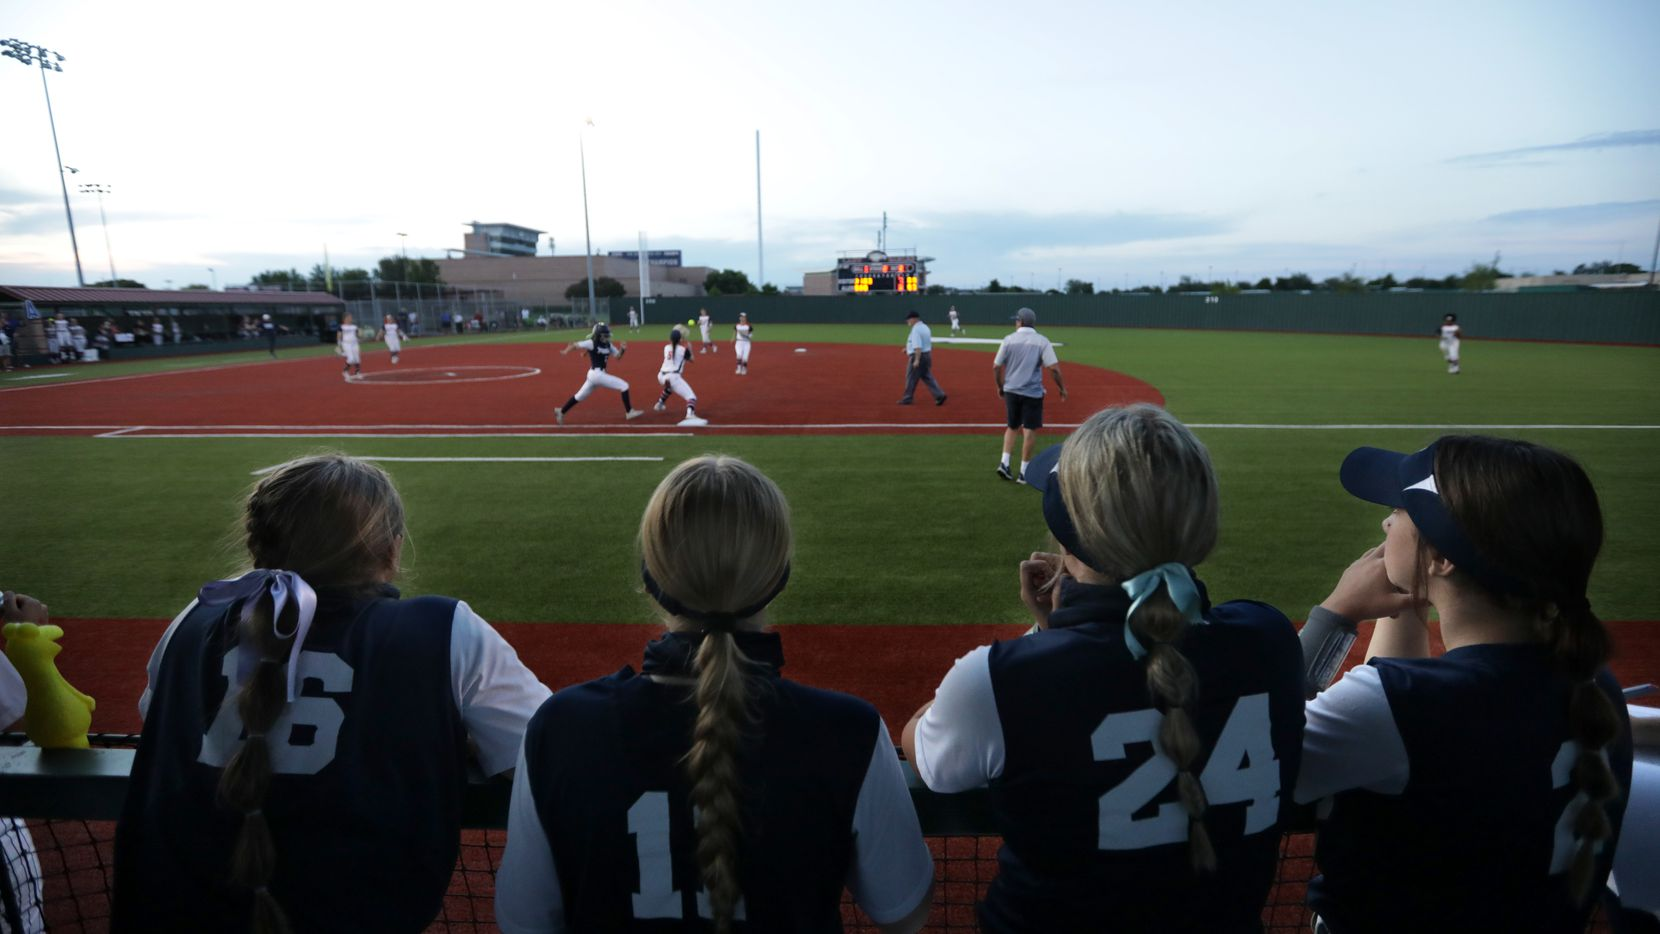 Flower Mound High School players cheer on their team during a softball game against Allen High School at Allen High School in Allen, TX, on May 14, 2021.